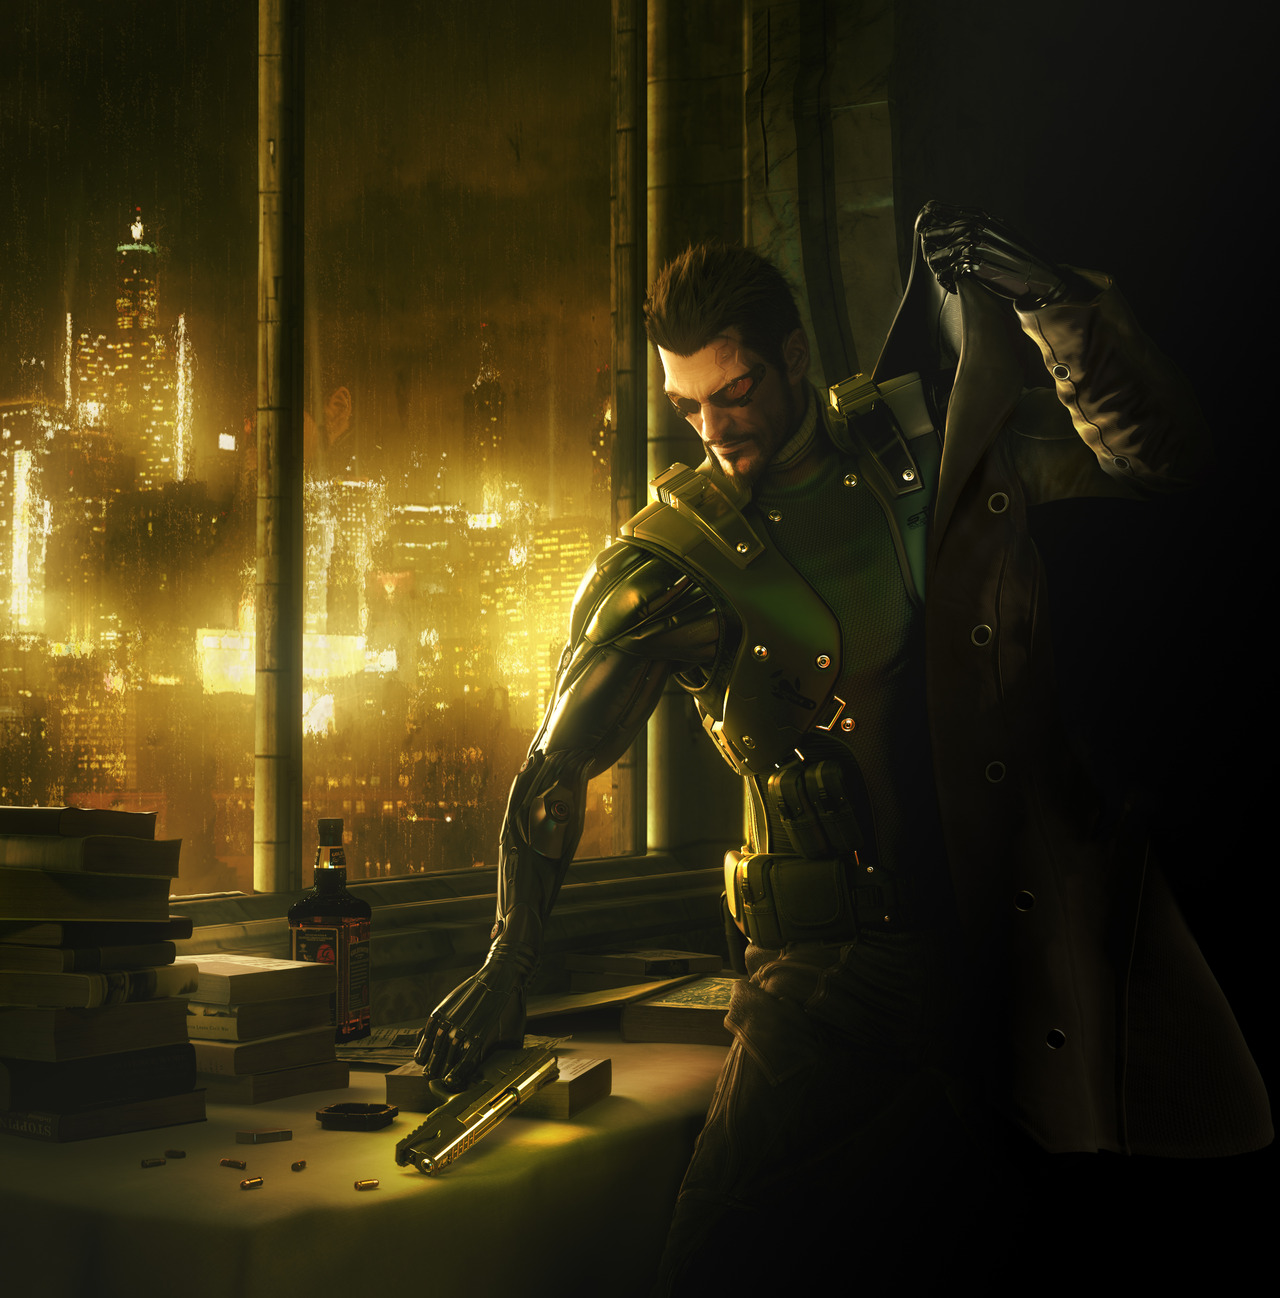 E3 2011 Galerie: Deus Ex: Human Revolution 43927